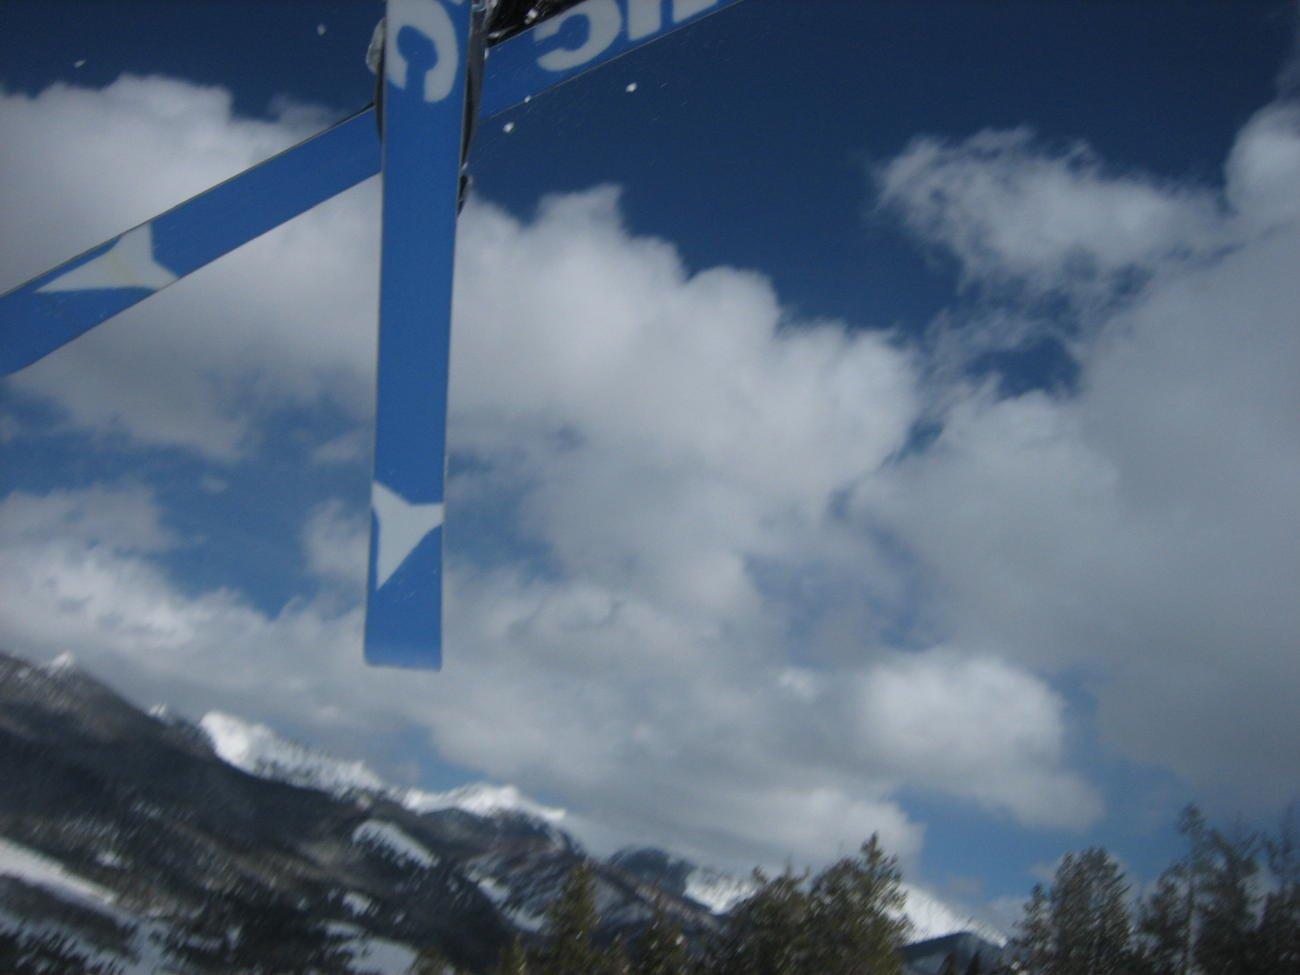 close shot of skis